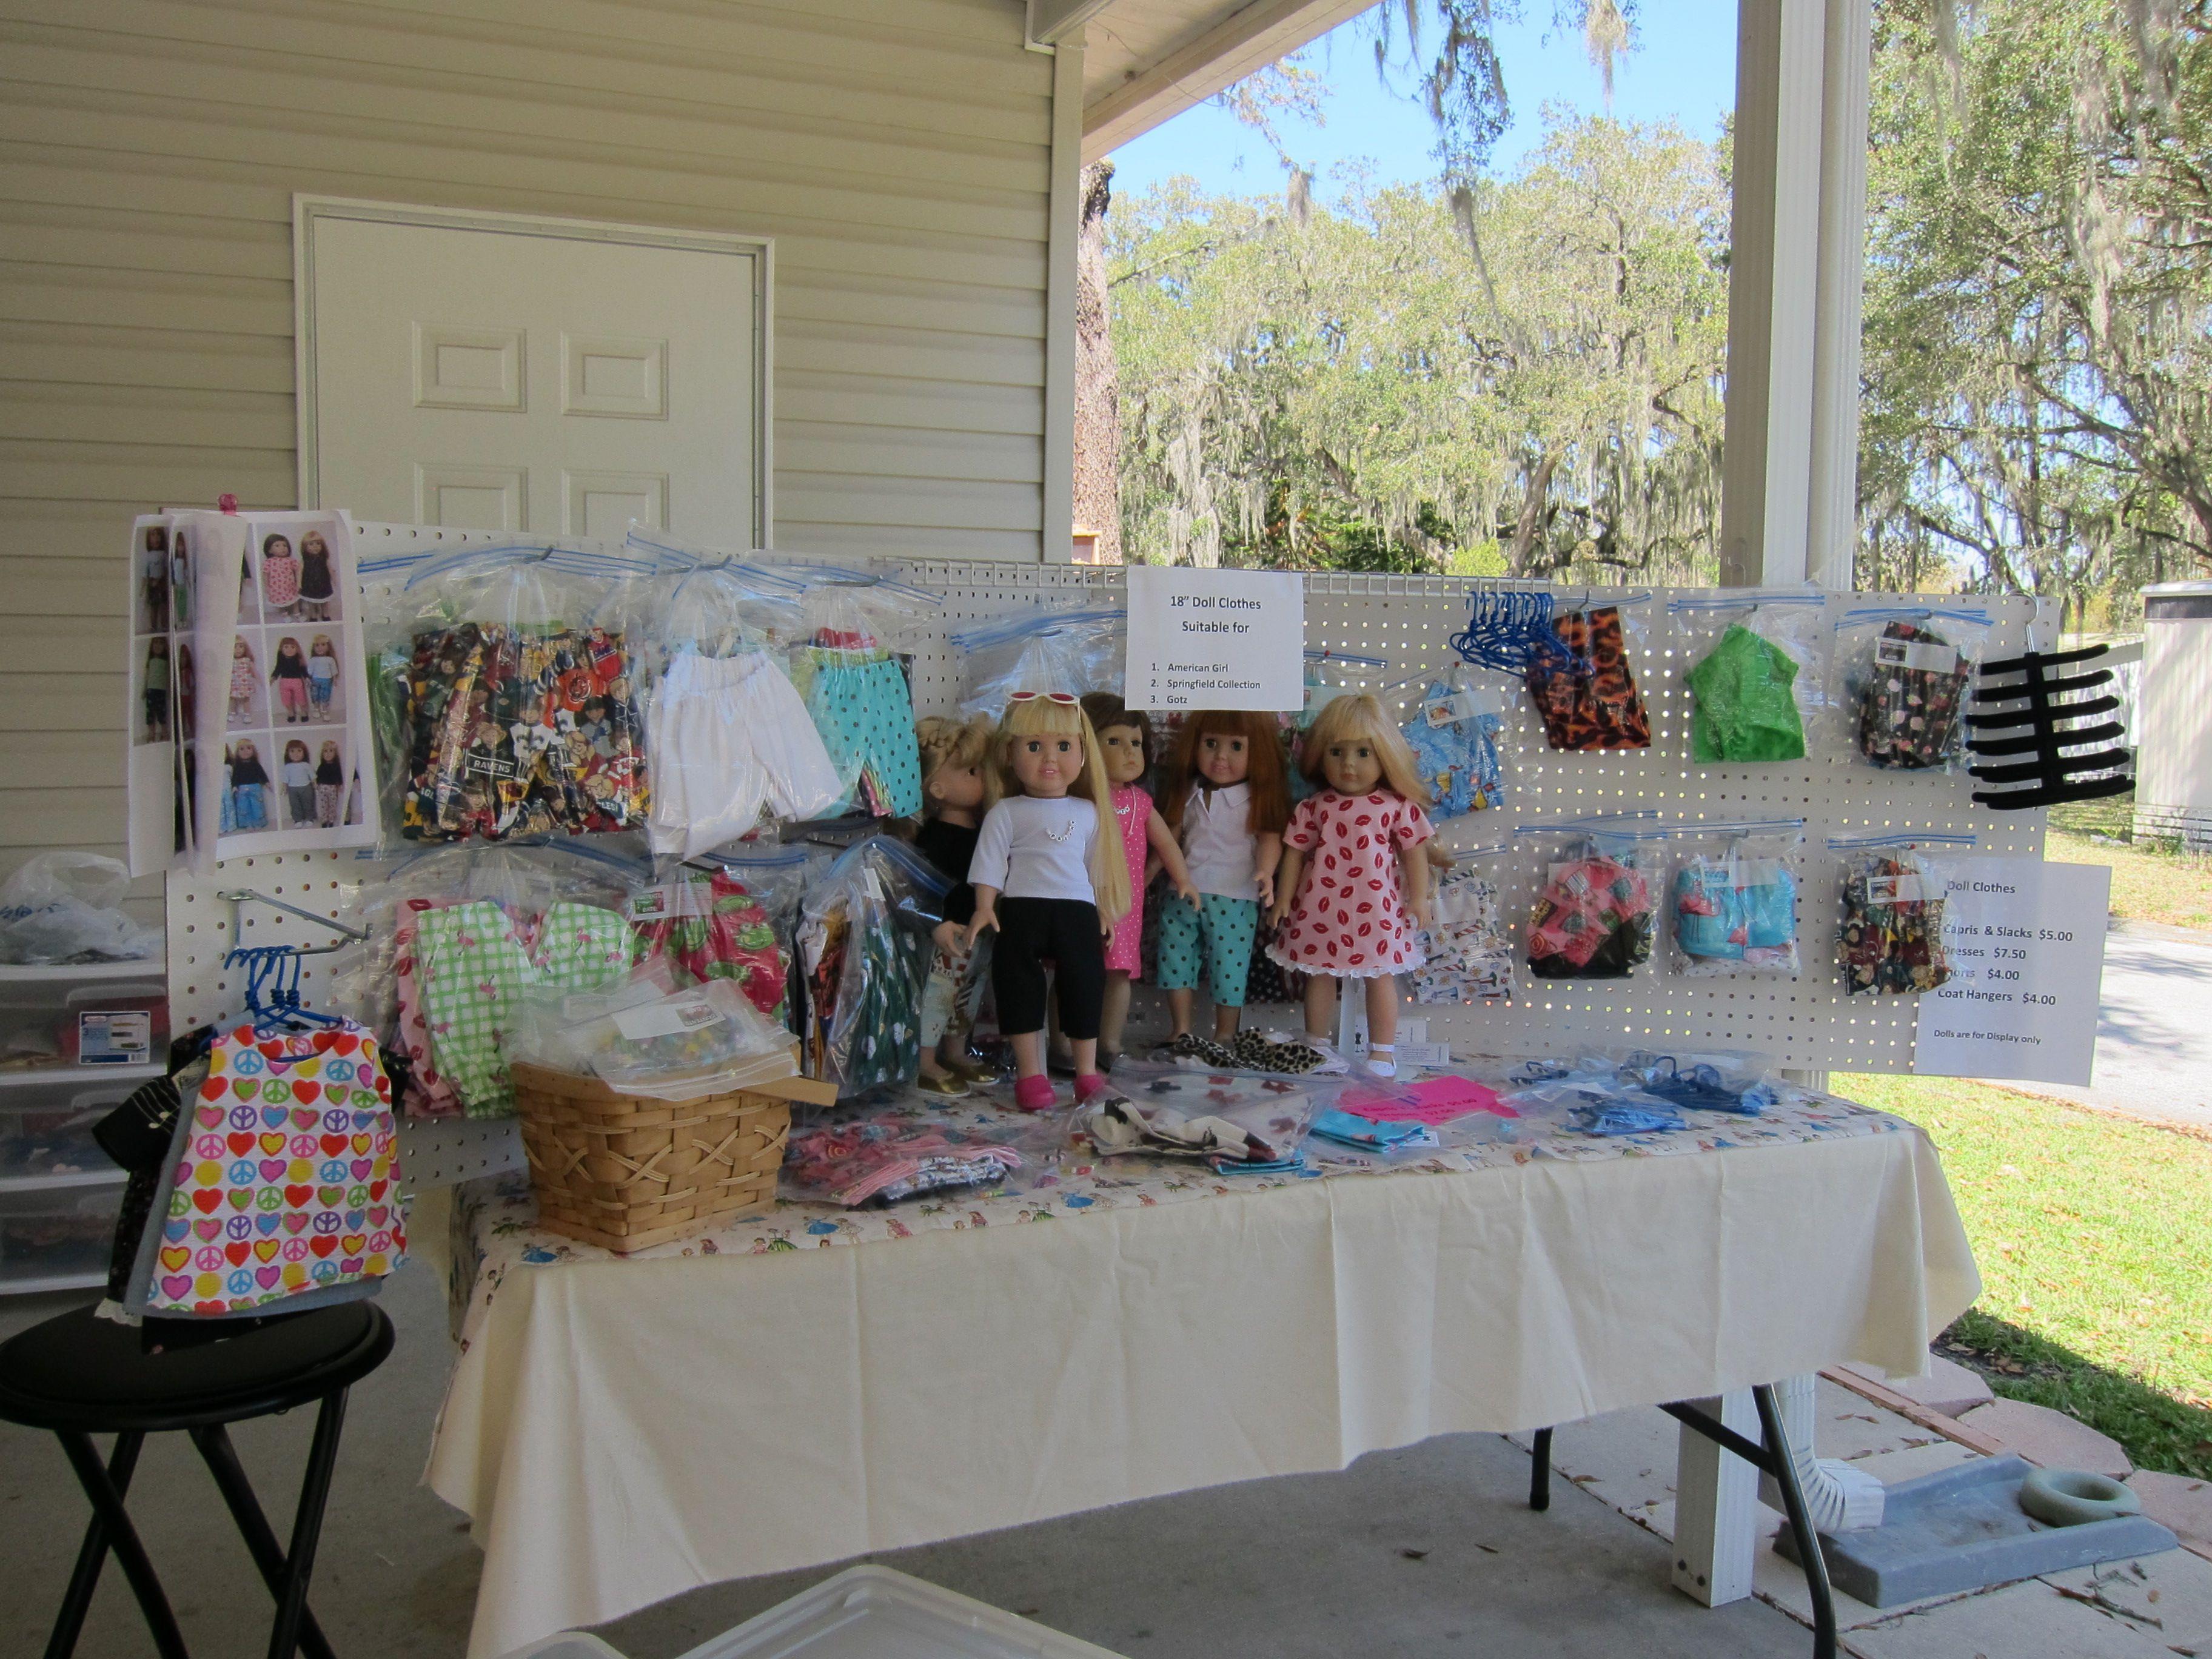 doll clothing display craft vendor booth display ideas. Black Bedroom Furniture Sets. Home Design Ideas